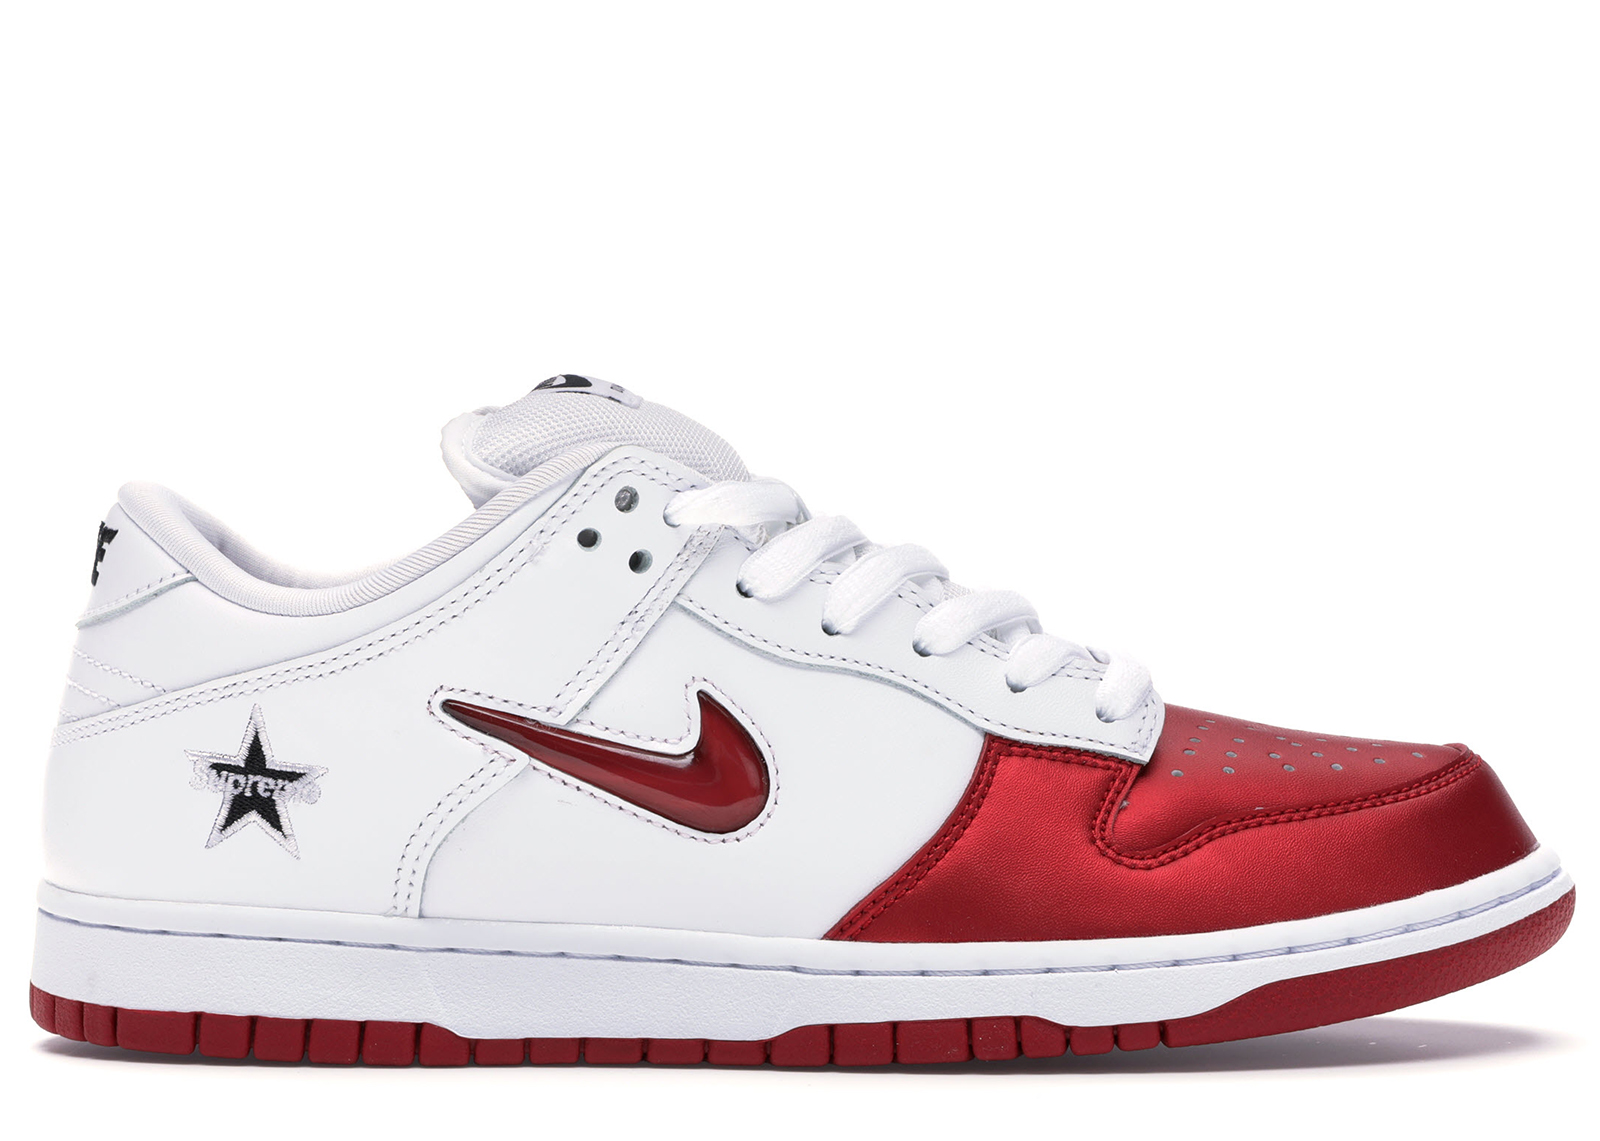 Nike SB Dunk Low Supreme Jewel Swoosh